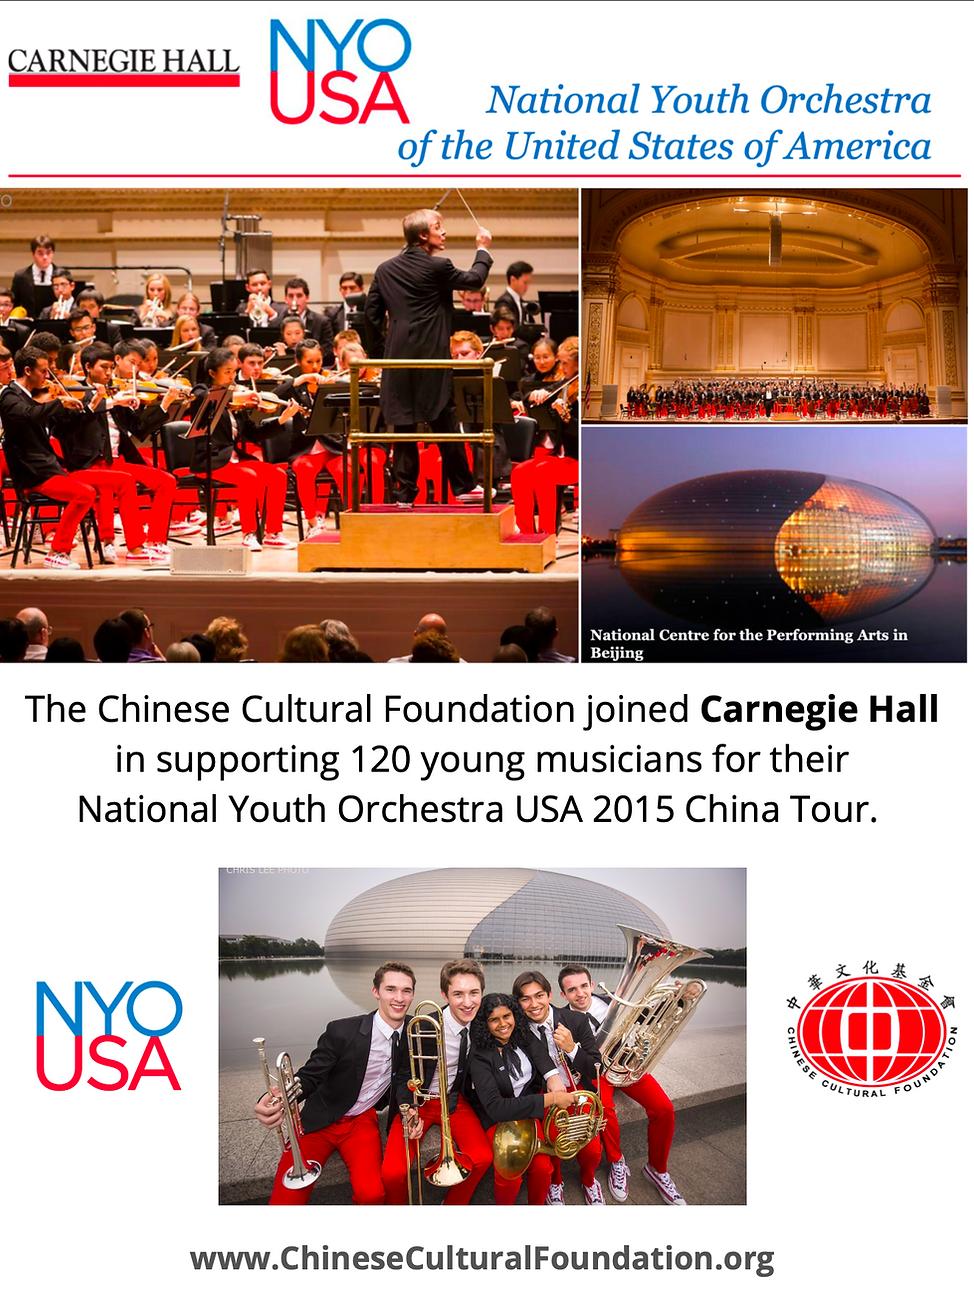 CCF-Carnegie Hall NYO-USA.png